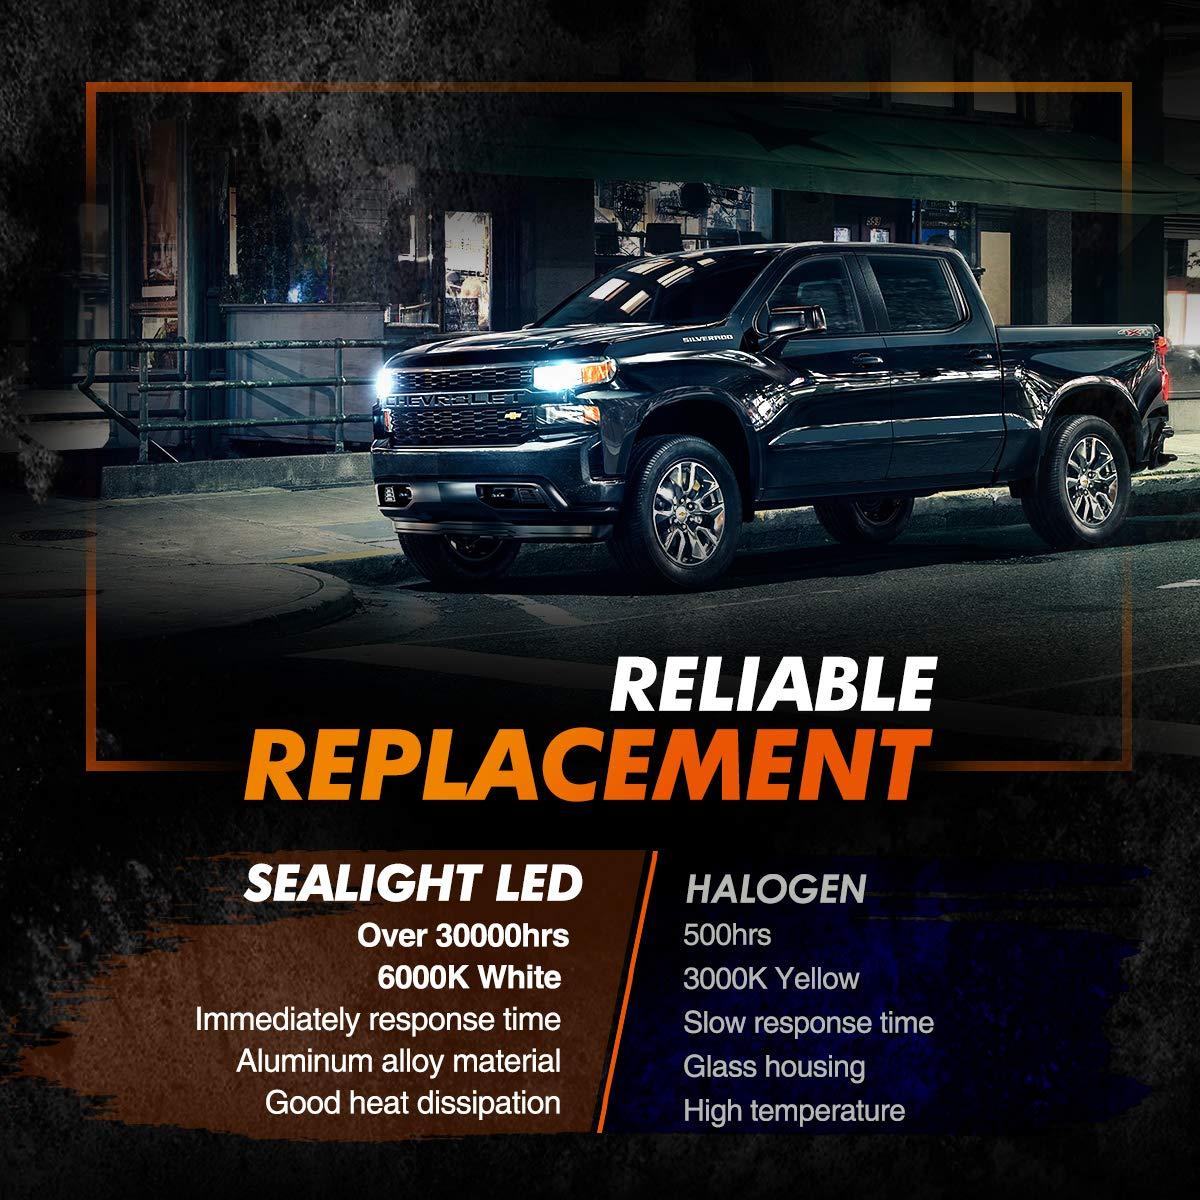 SEALIGHT H11 H9 H8 LED Headlight Bulbs Fanless 6000K White Low Beam H16 Fog lights CSP Chips Halogen Headlight Replacement 30W 5000Lumens